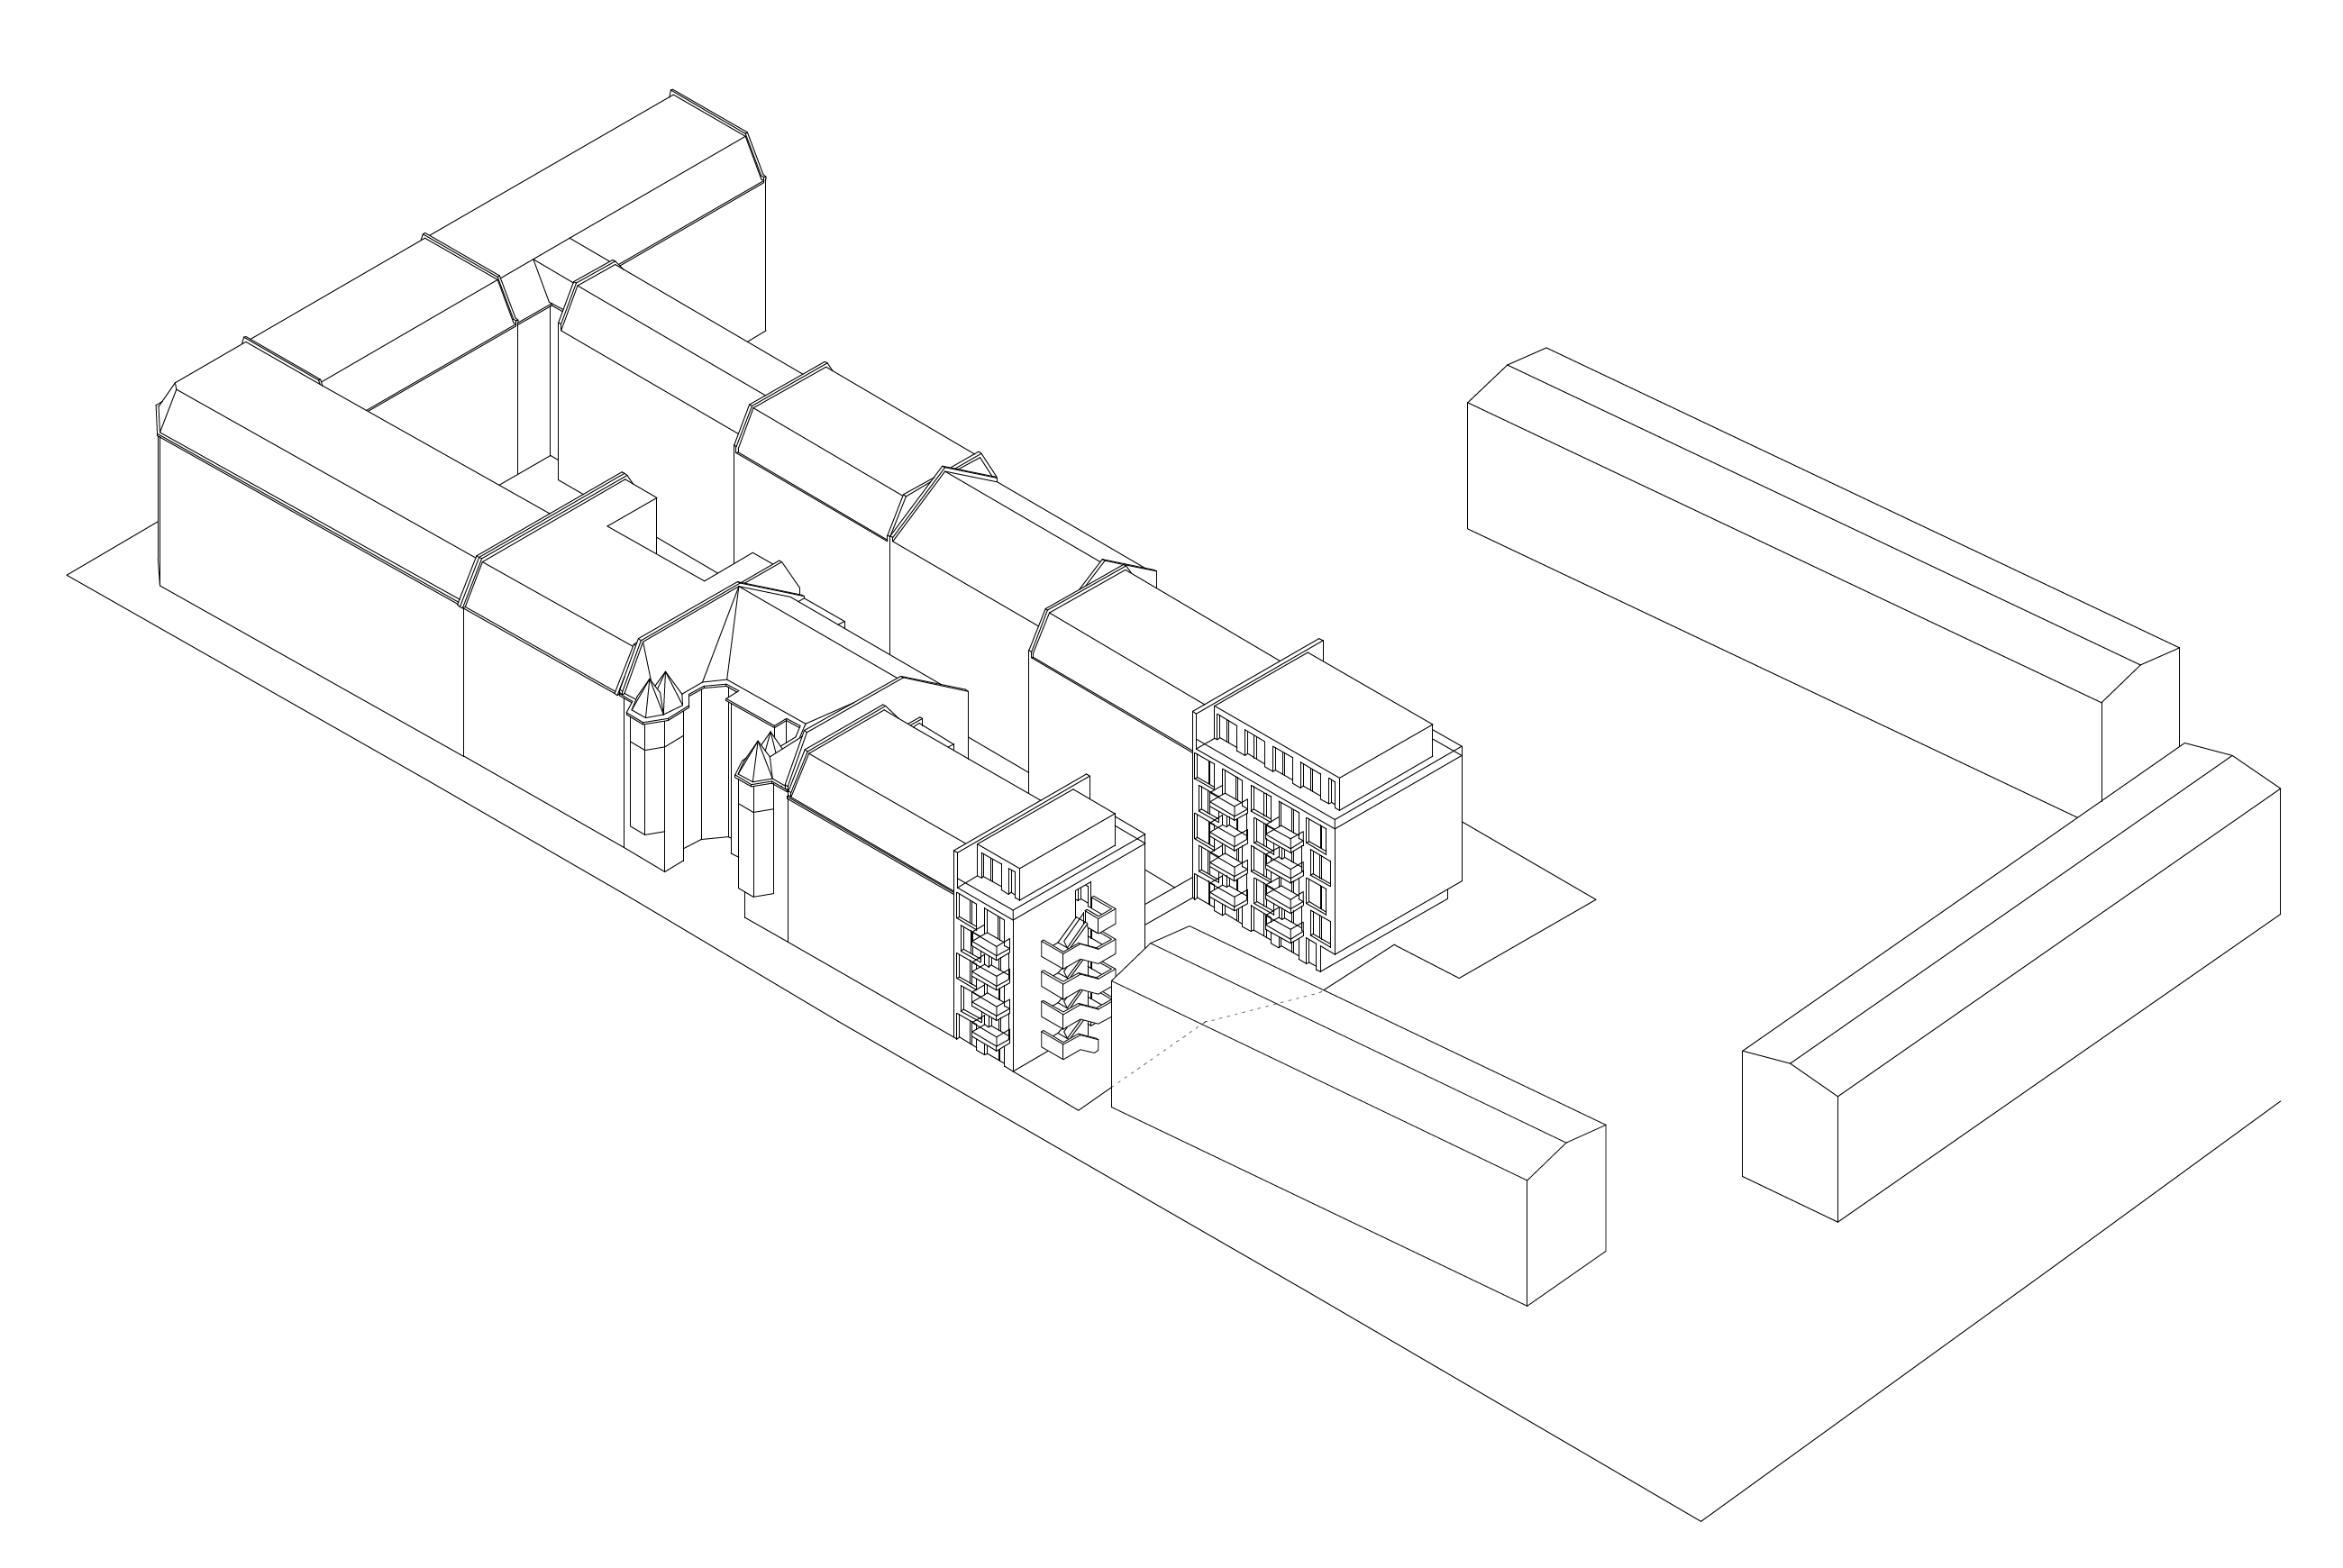 Wohnbebauung Rathenaustraße